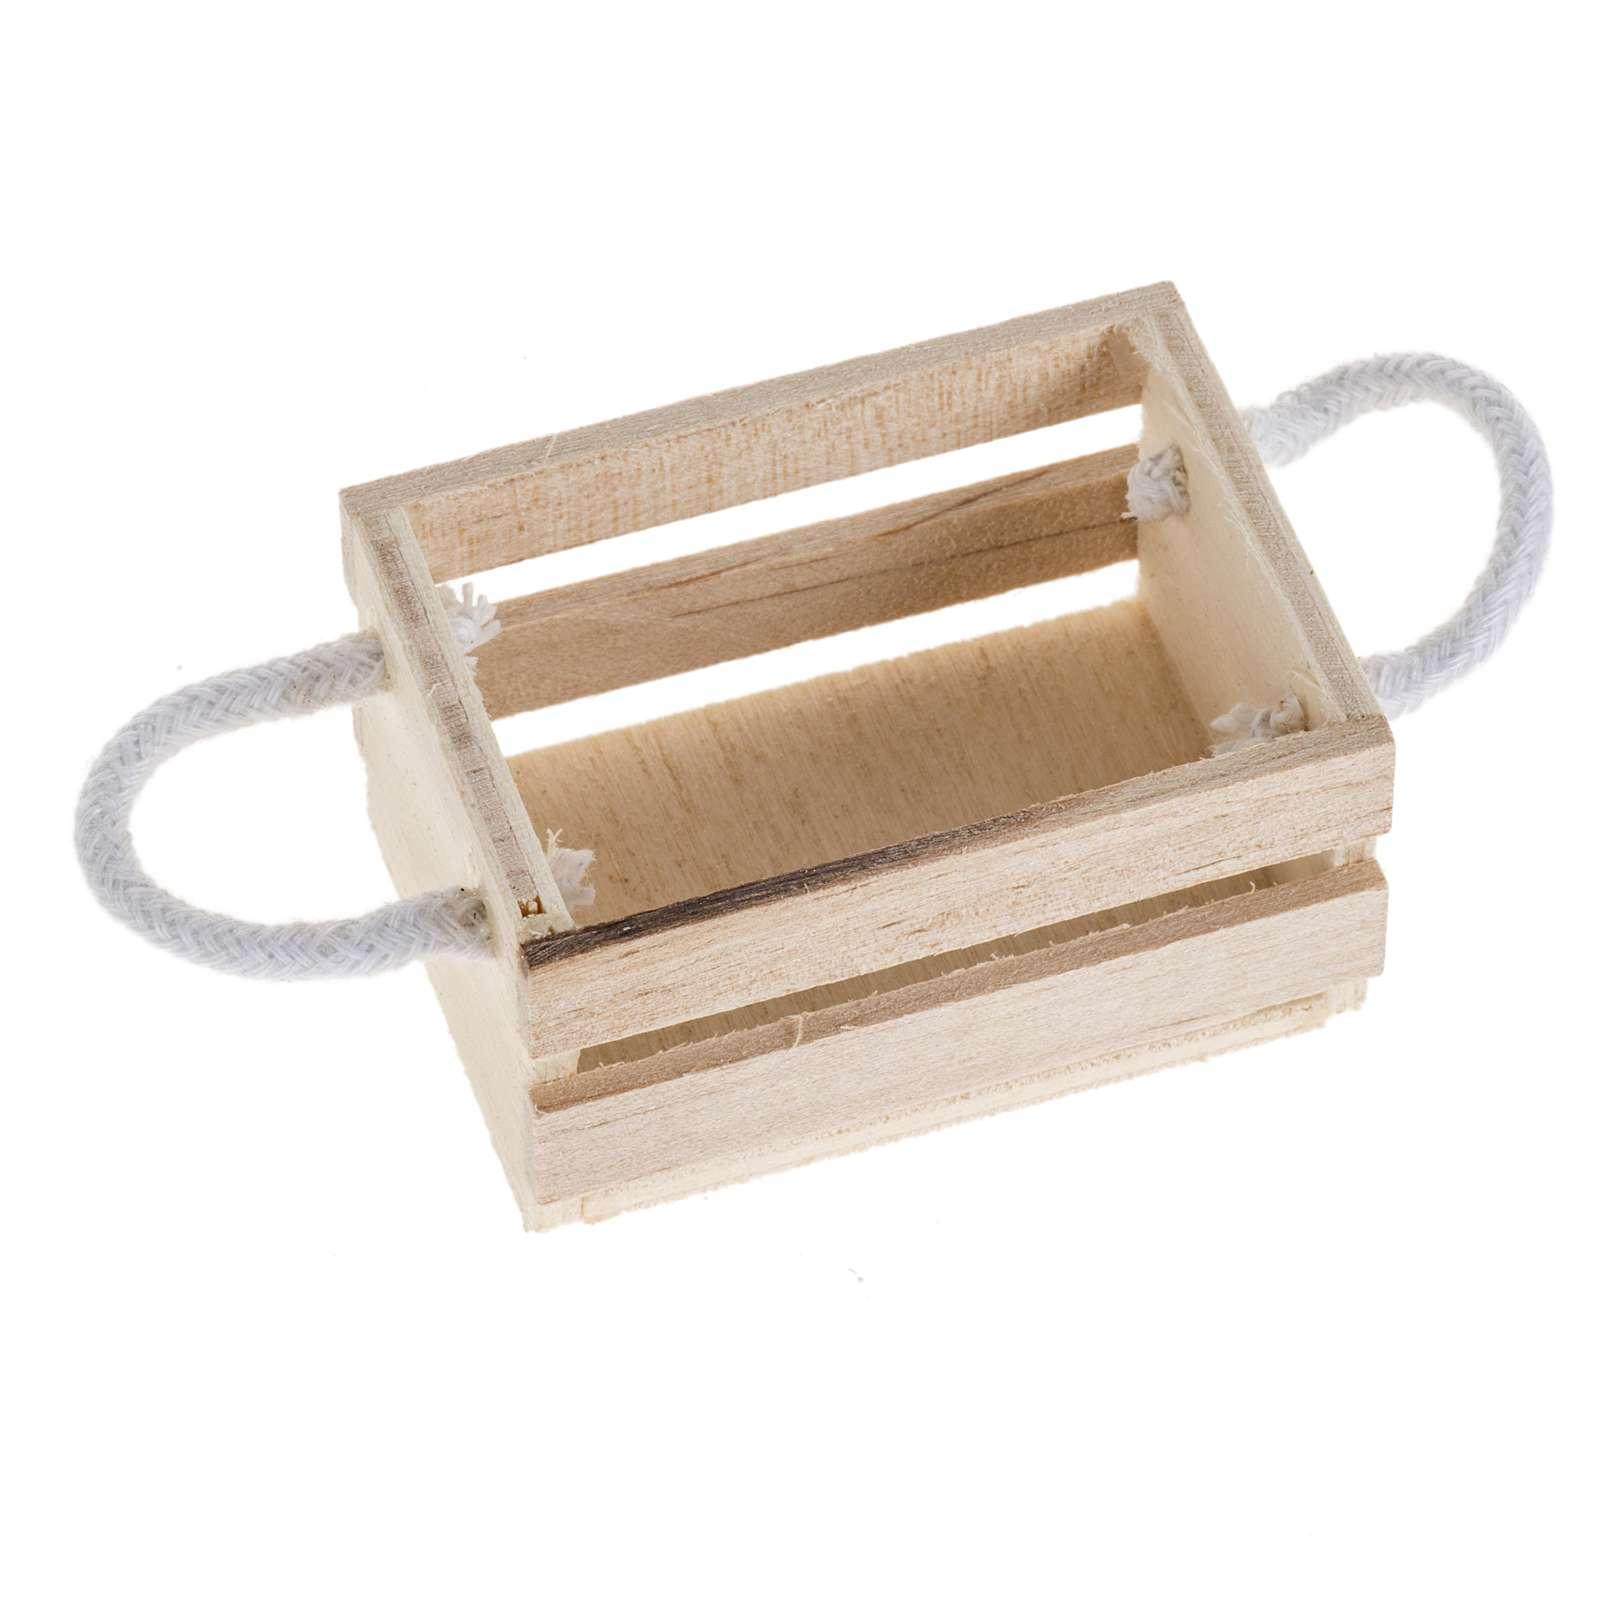 Caja de madera con asas de cuerda 4